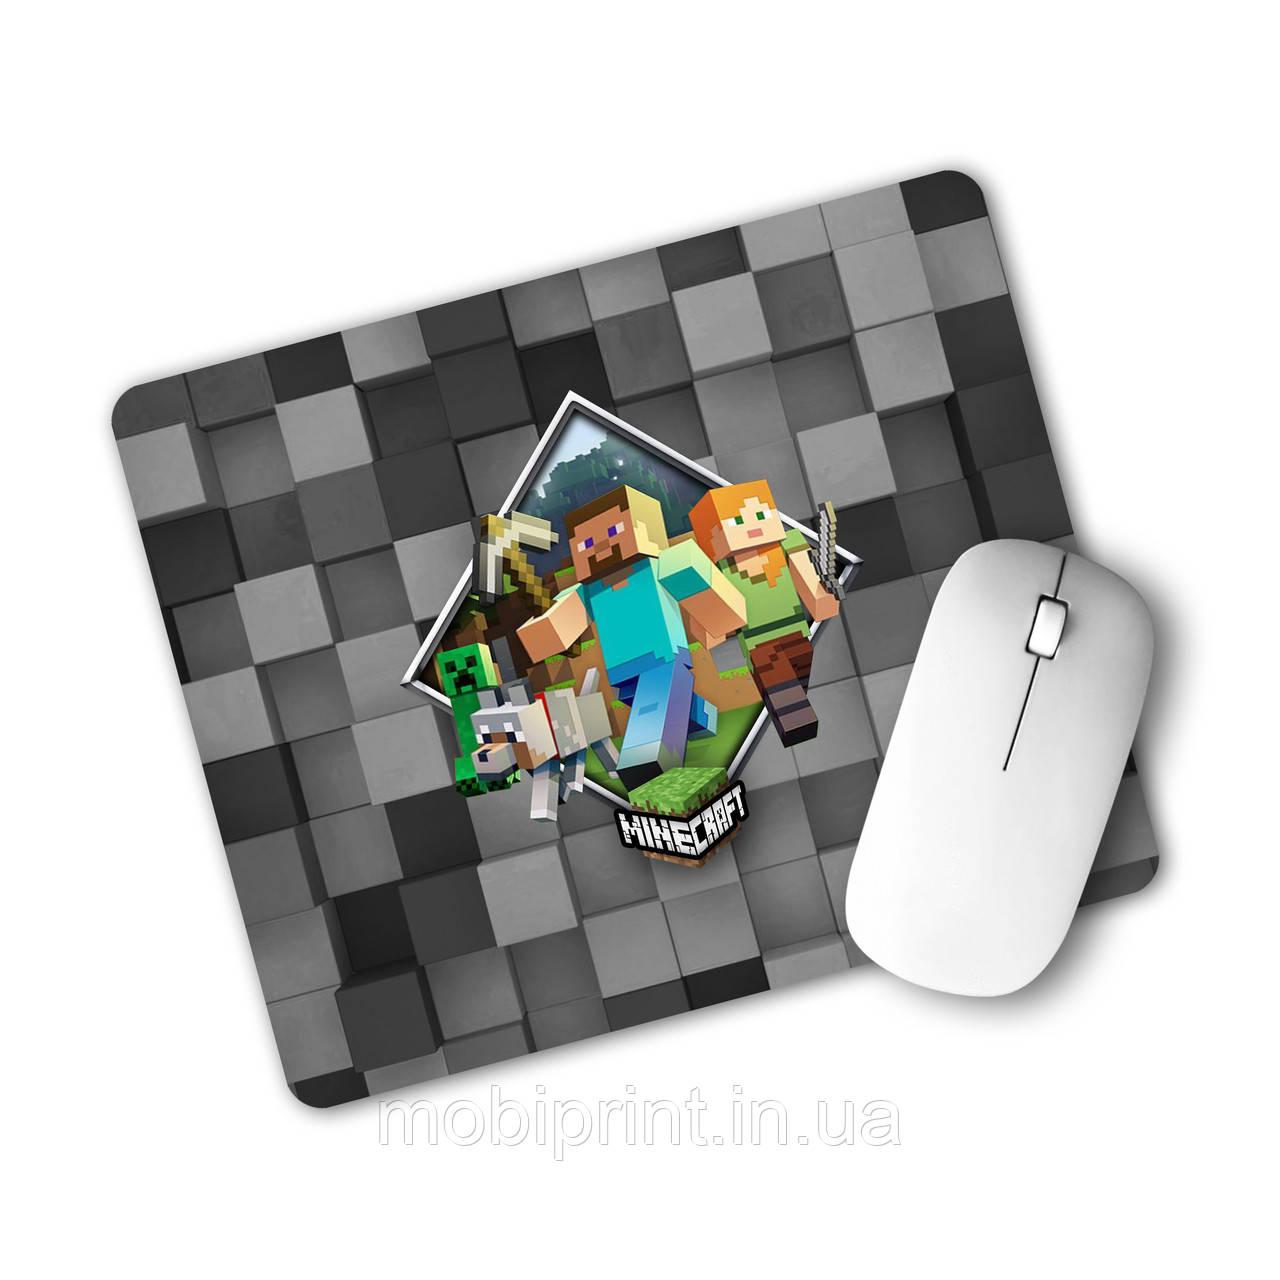 Коврик для мышки Майнкрафт (Minecraft)  (25108-1175)